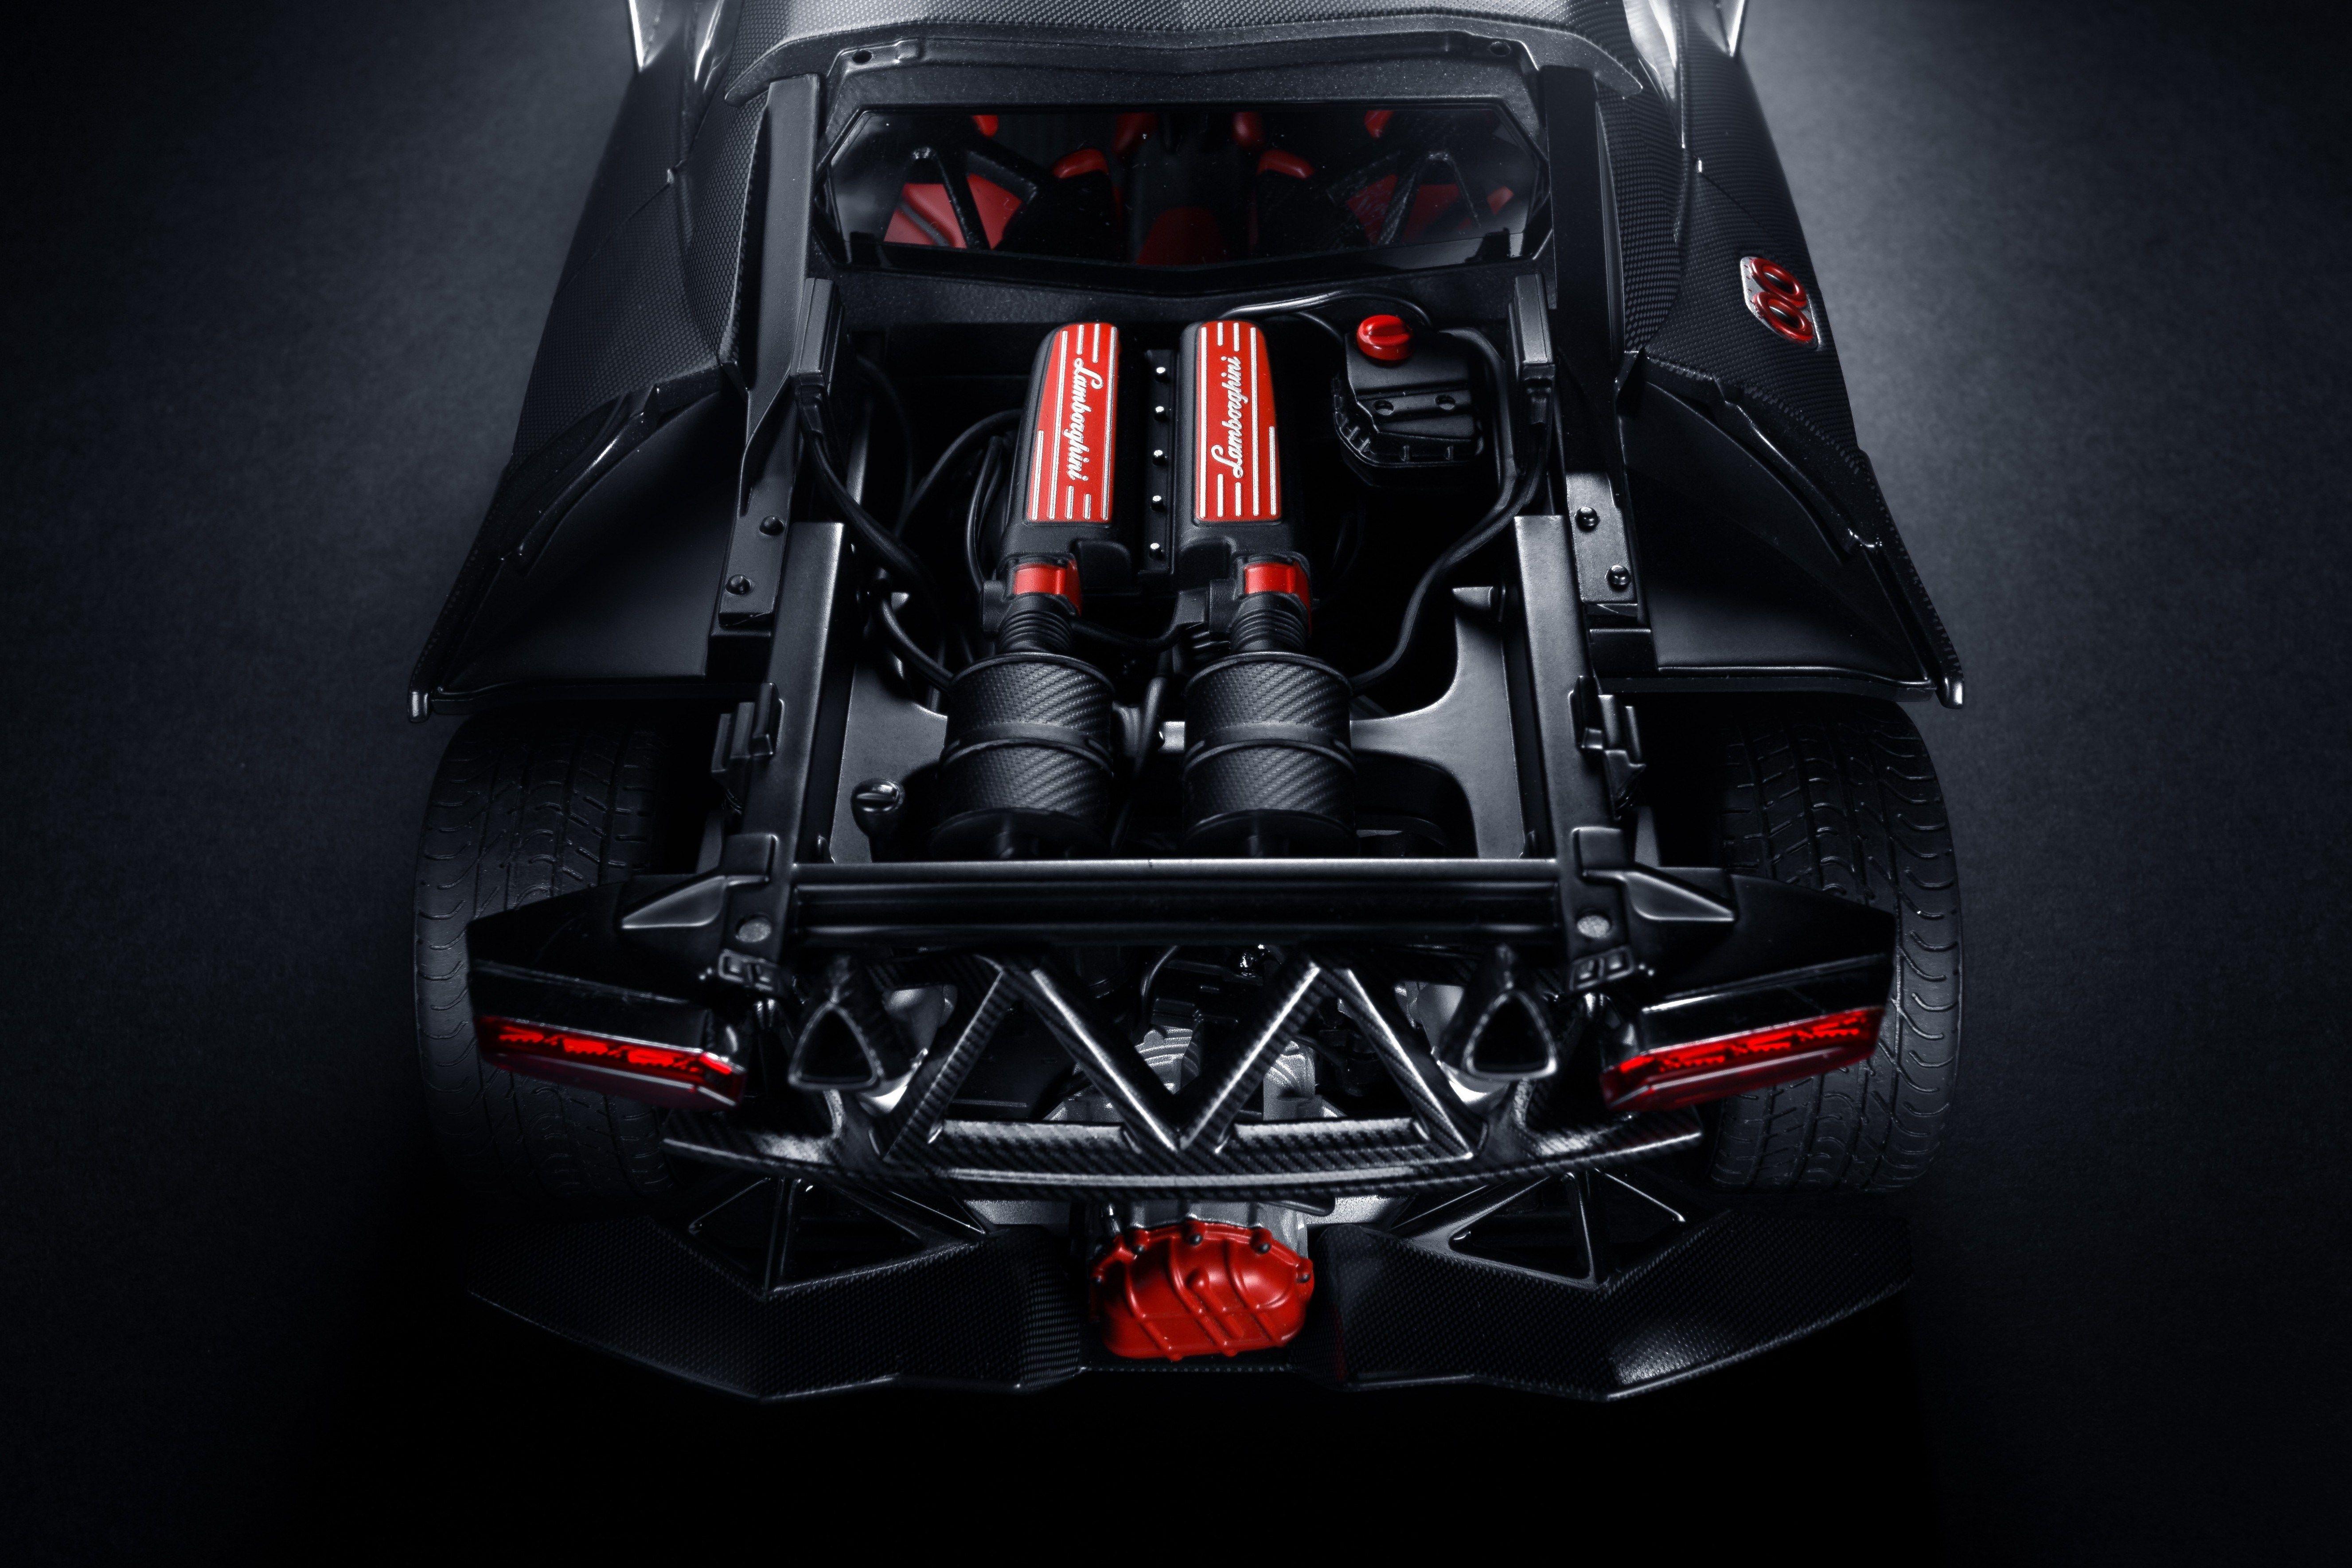 Pin By Exhaustive On Exhaustiveonline Lamborghini